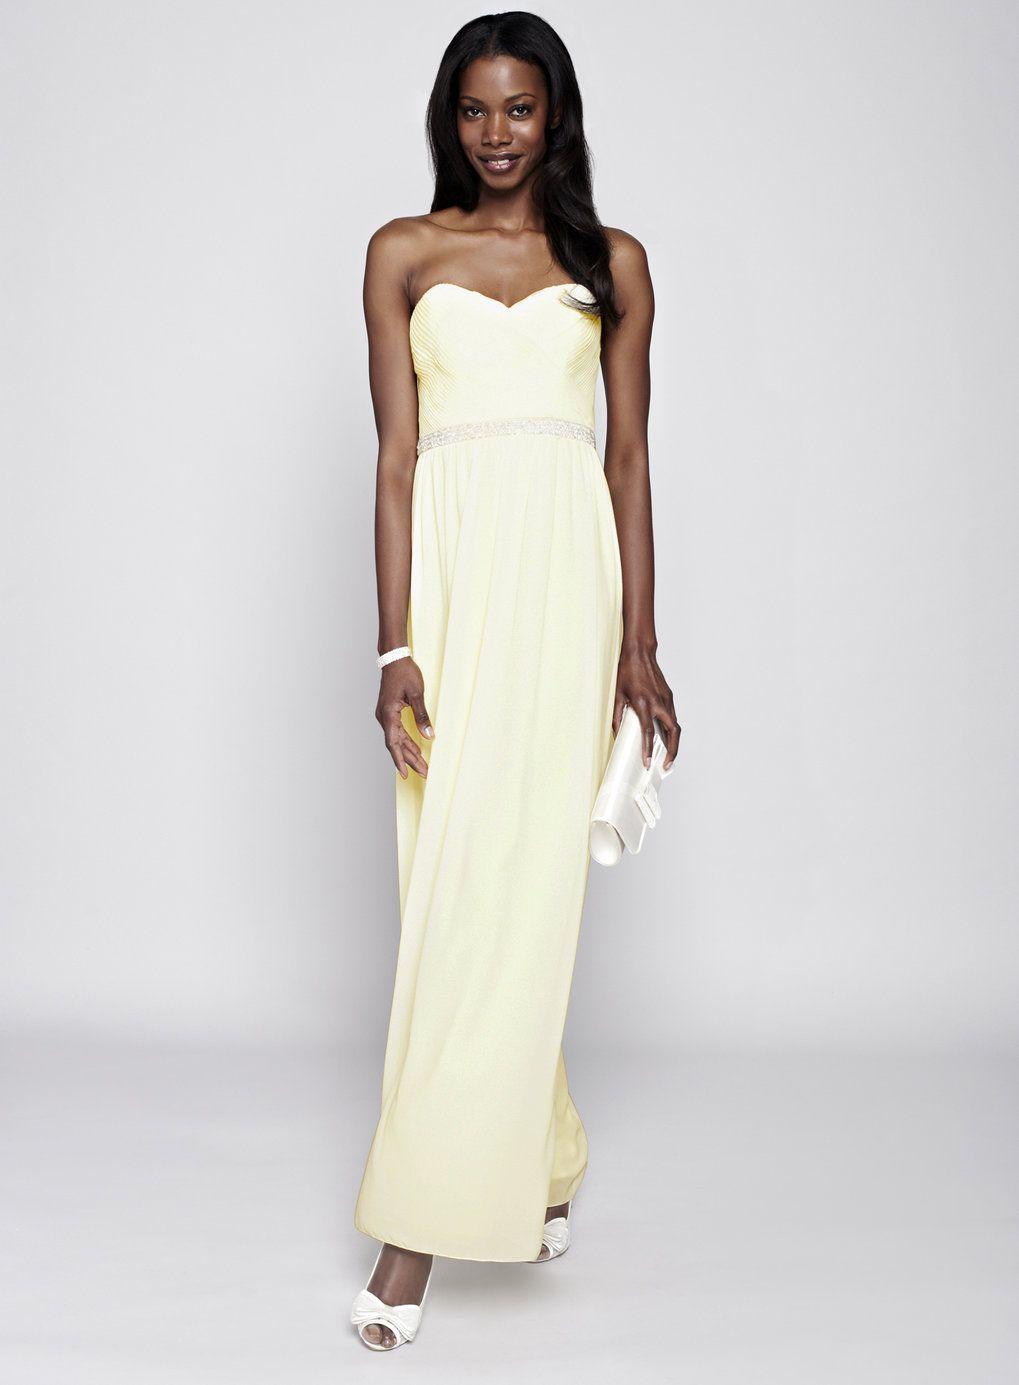 Wedding dresses bhs bridesmaids vosoi lemon alana bridesmaid dress bhs wedding pinterest ombrellifo Gallery